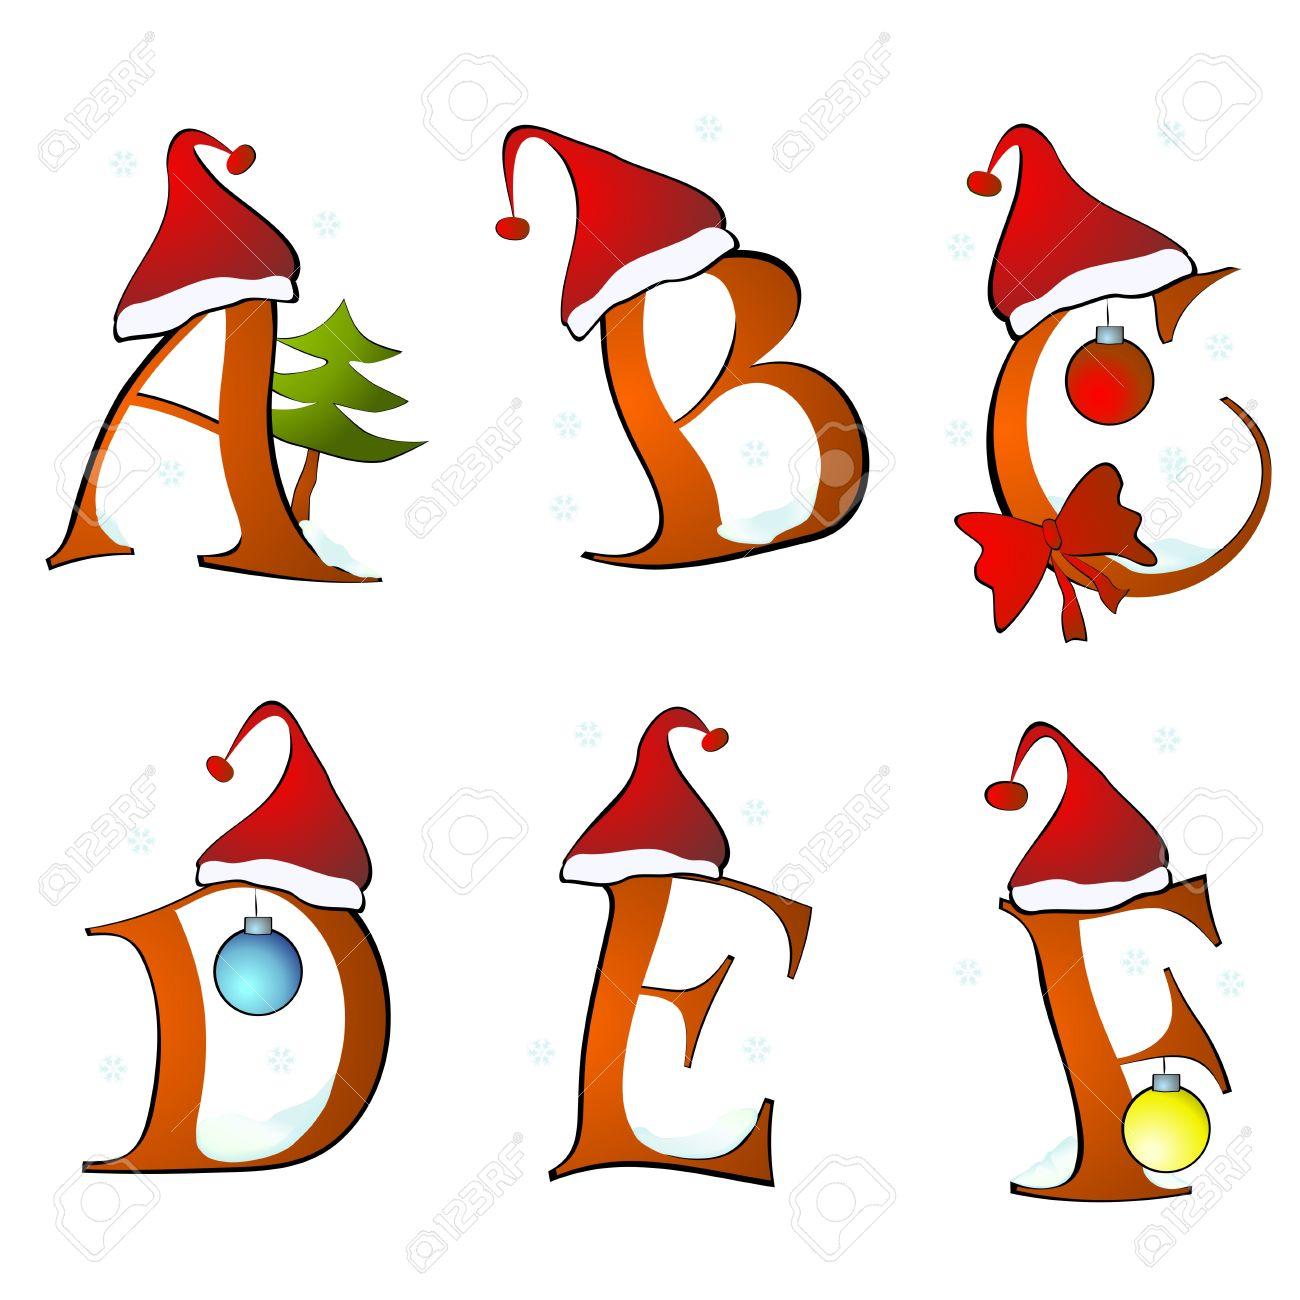 B Font Christmas: Christmas Alphabet Set Letters Winter A F Illustration